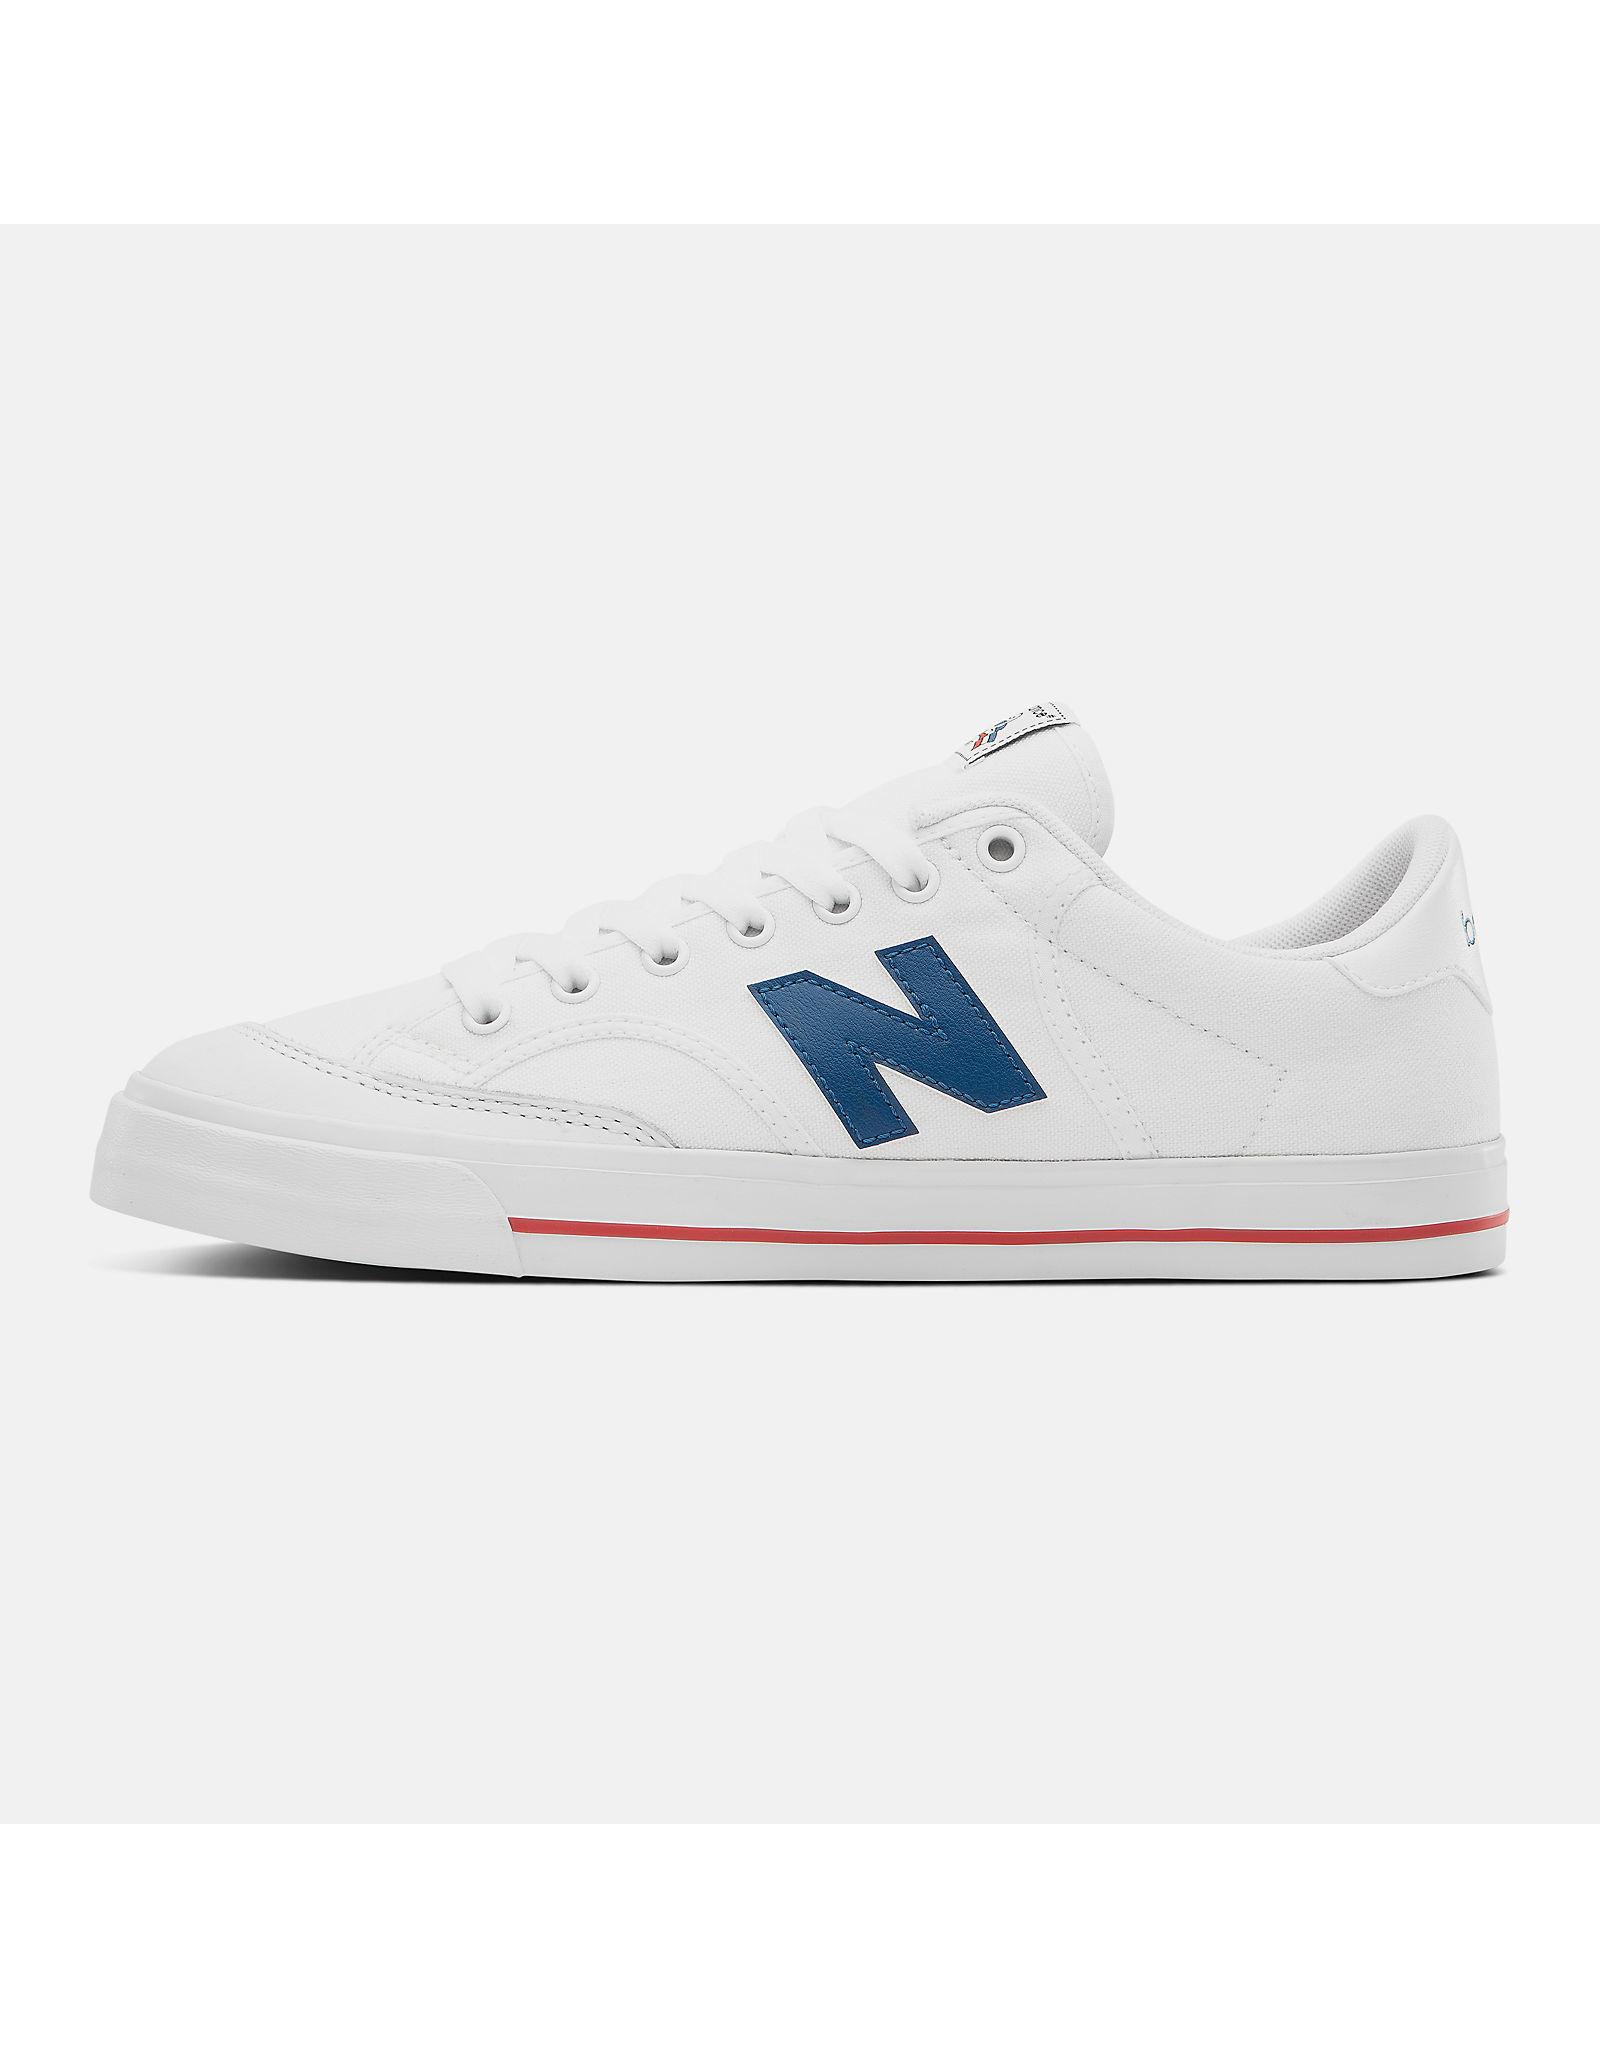 NEW BALANCE NEW BALANCE - 212 - WHITE/BLUE